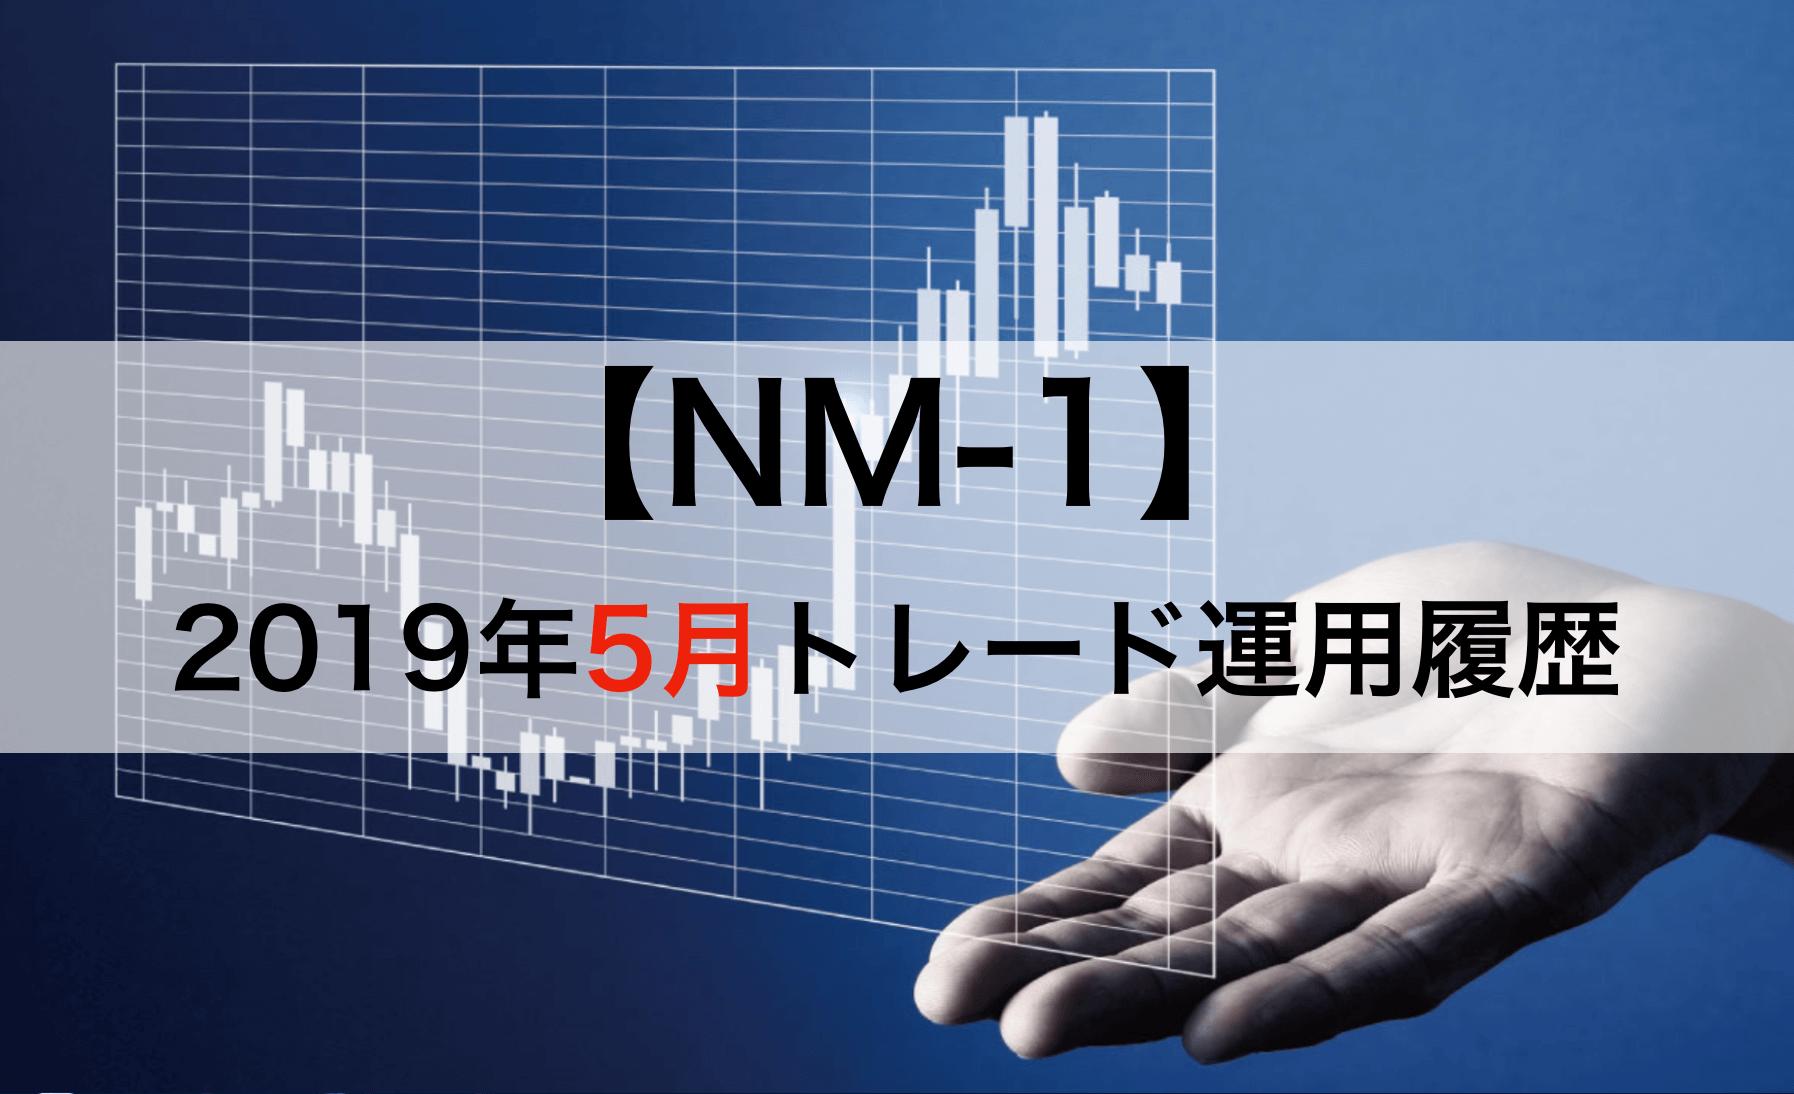 2019年5月のNM1自動売買結果